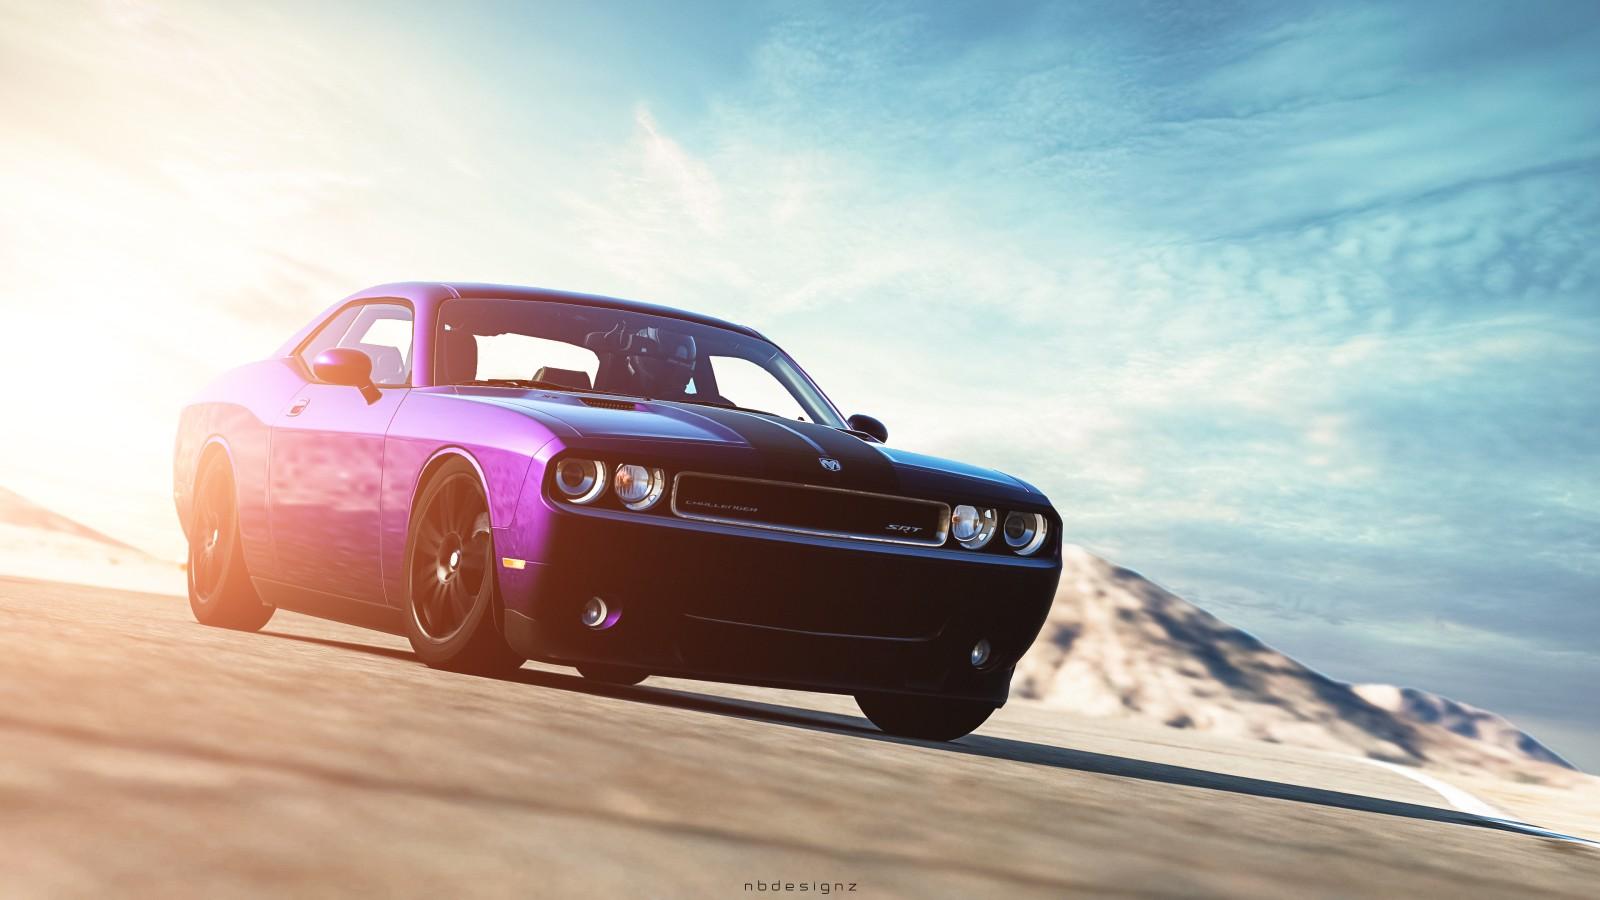 Dodge Challenger Srt8 Gran Turismo 6 Wallpaper Hd Car